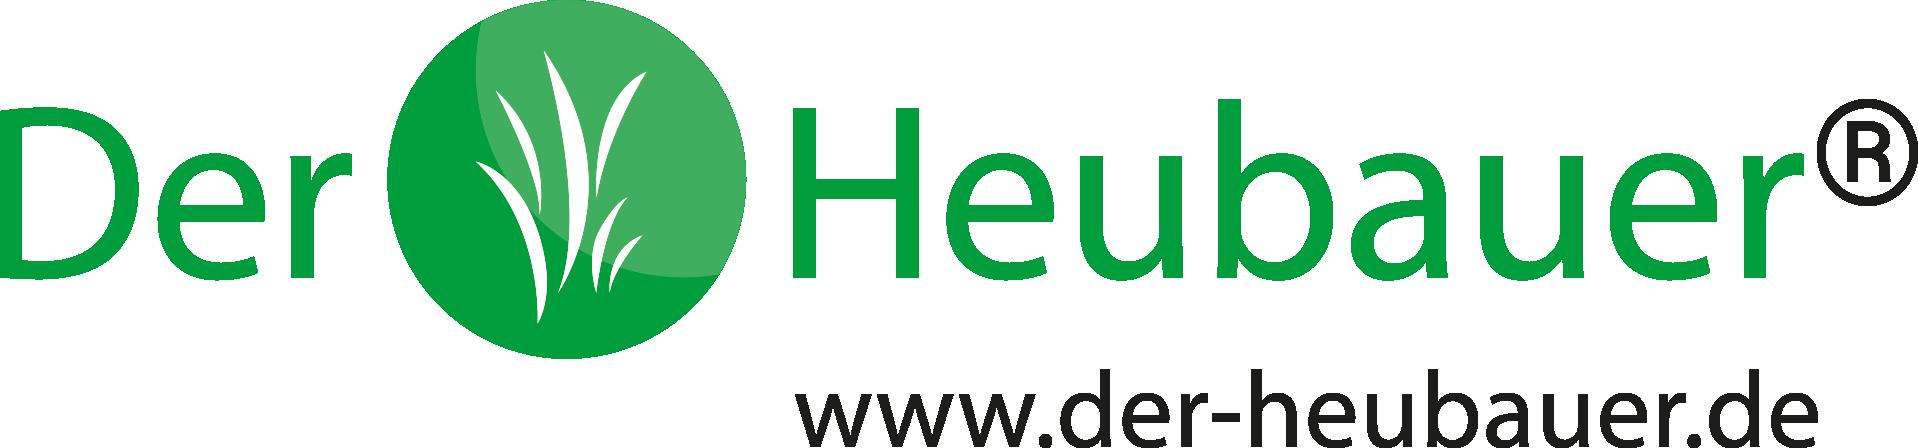 Heubauer_logo-r